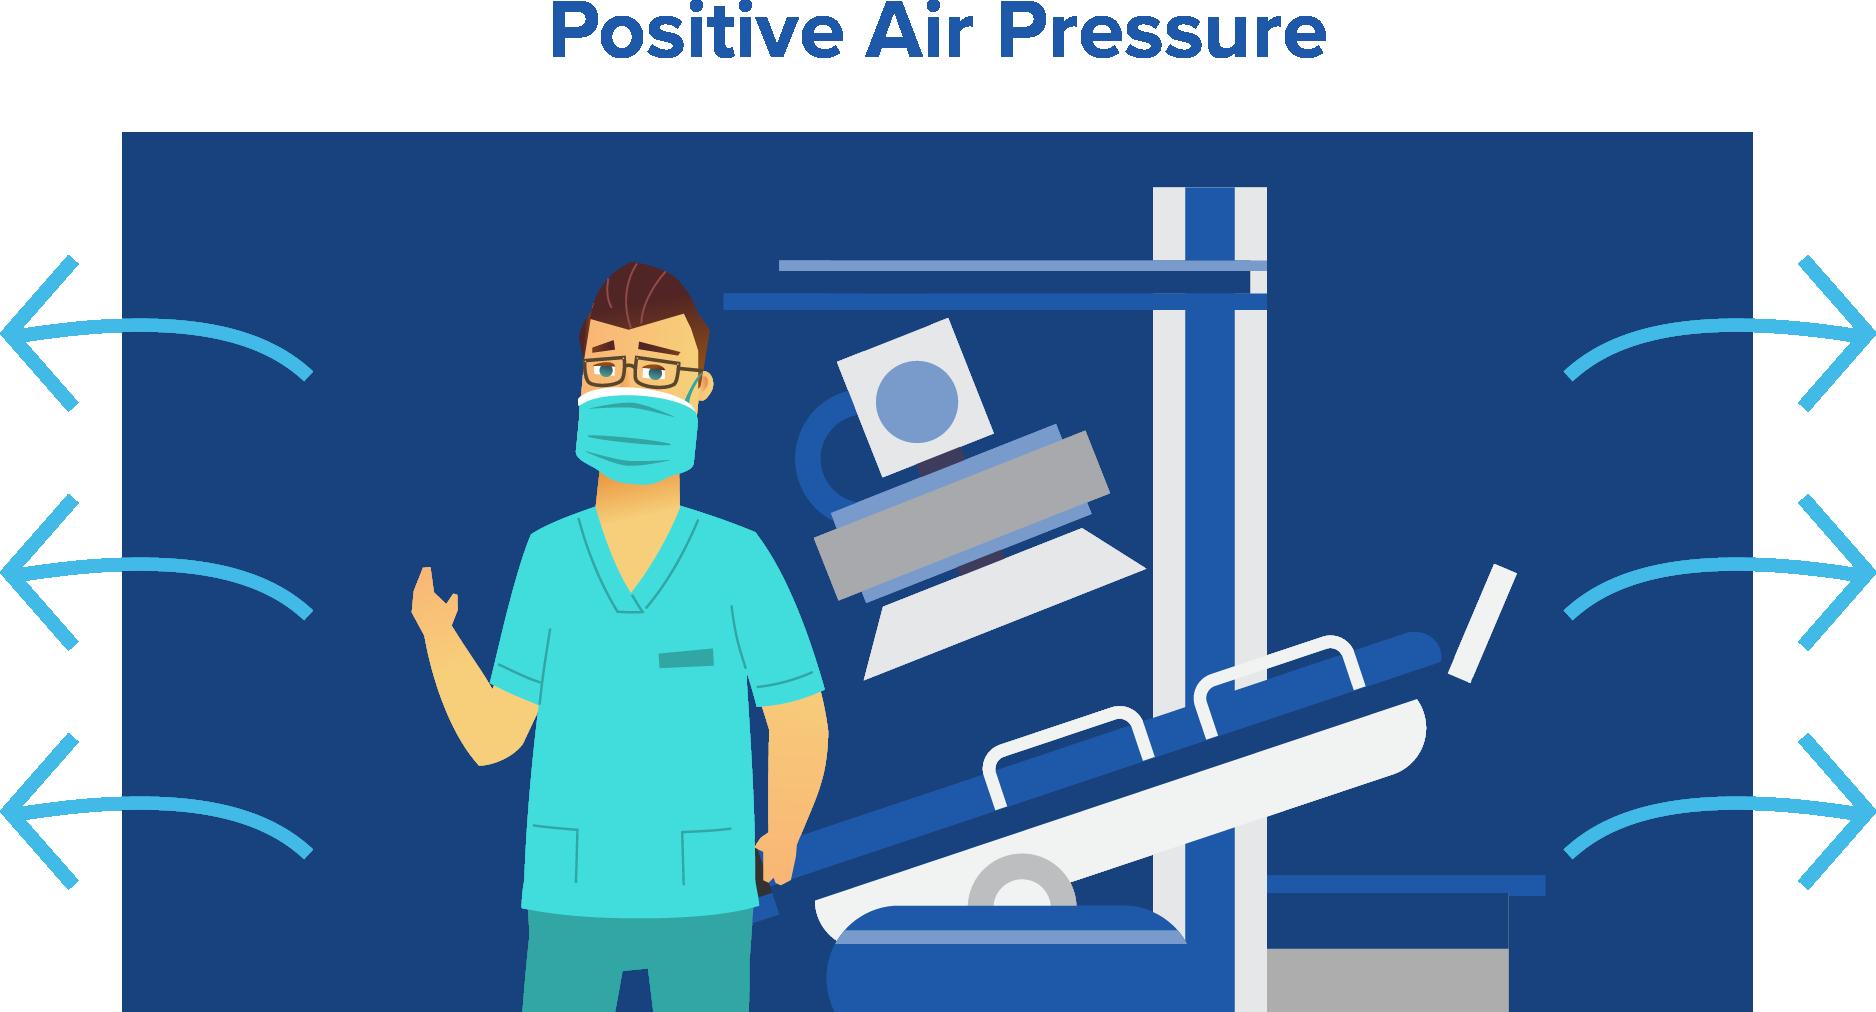 Content_PositiveAirPressure_SterileRoom